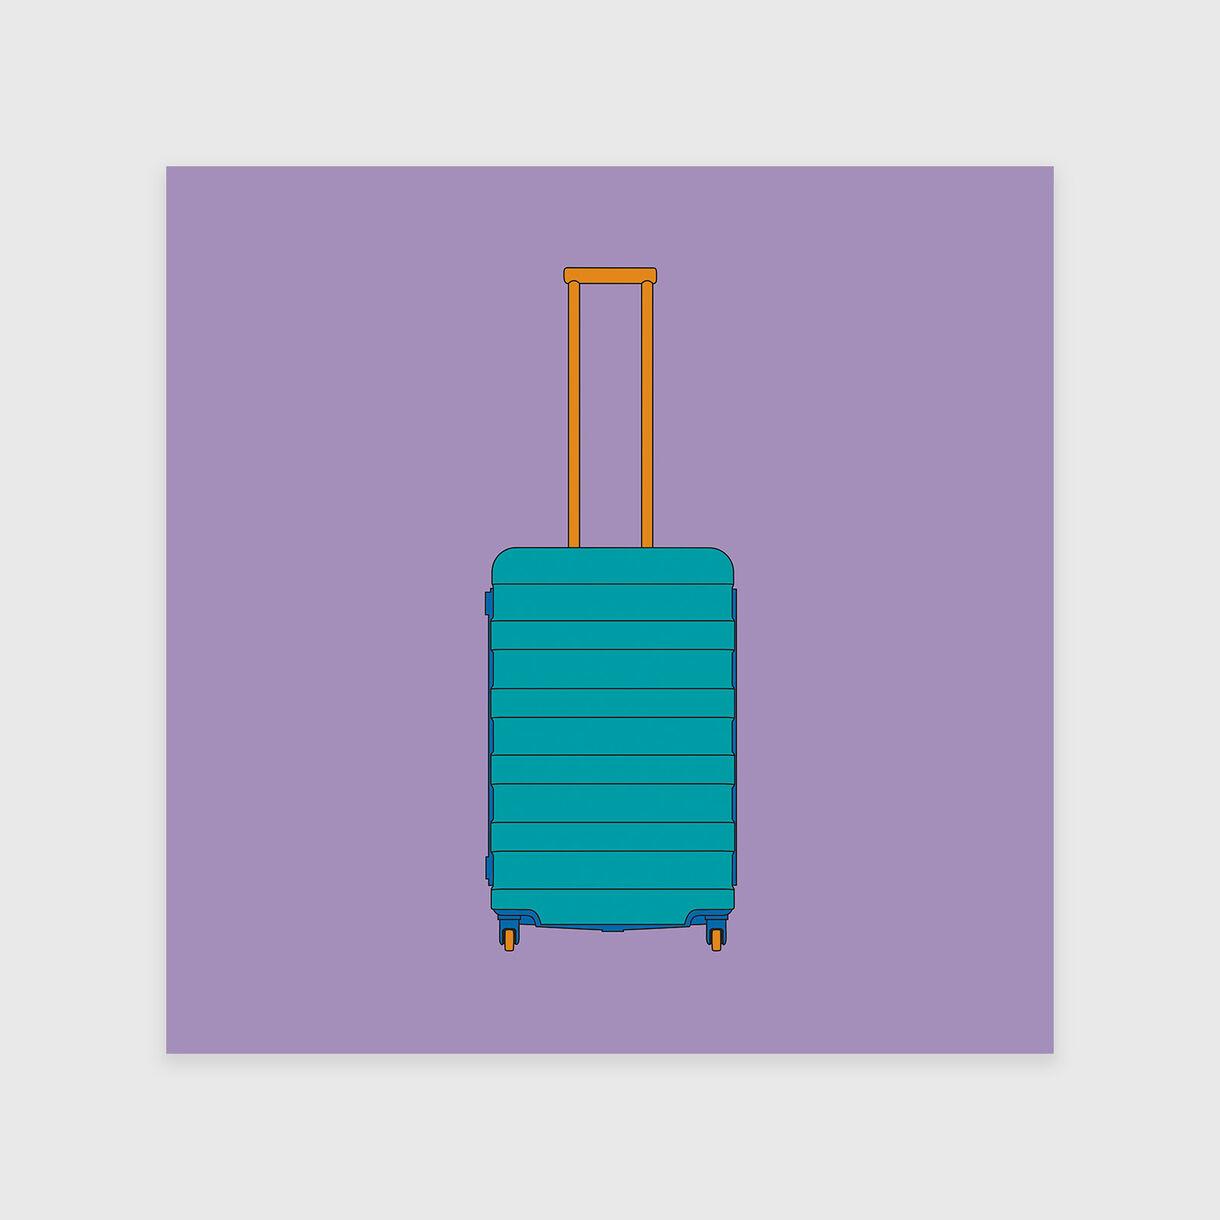 4 Wheel Suitcase, Michael Craig-Martin